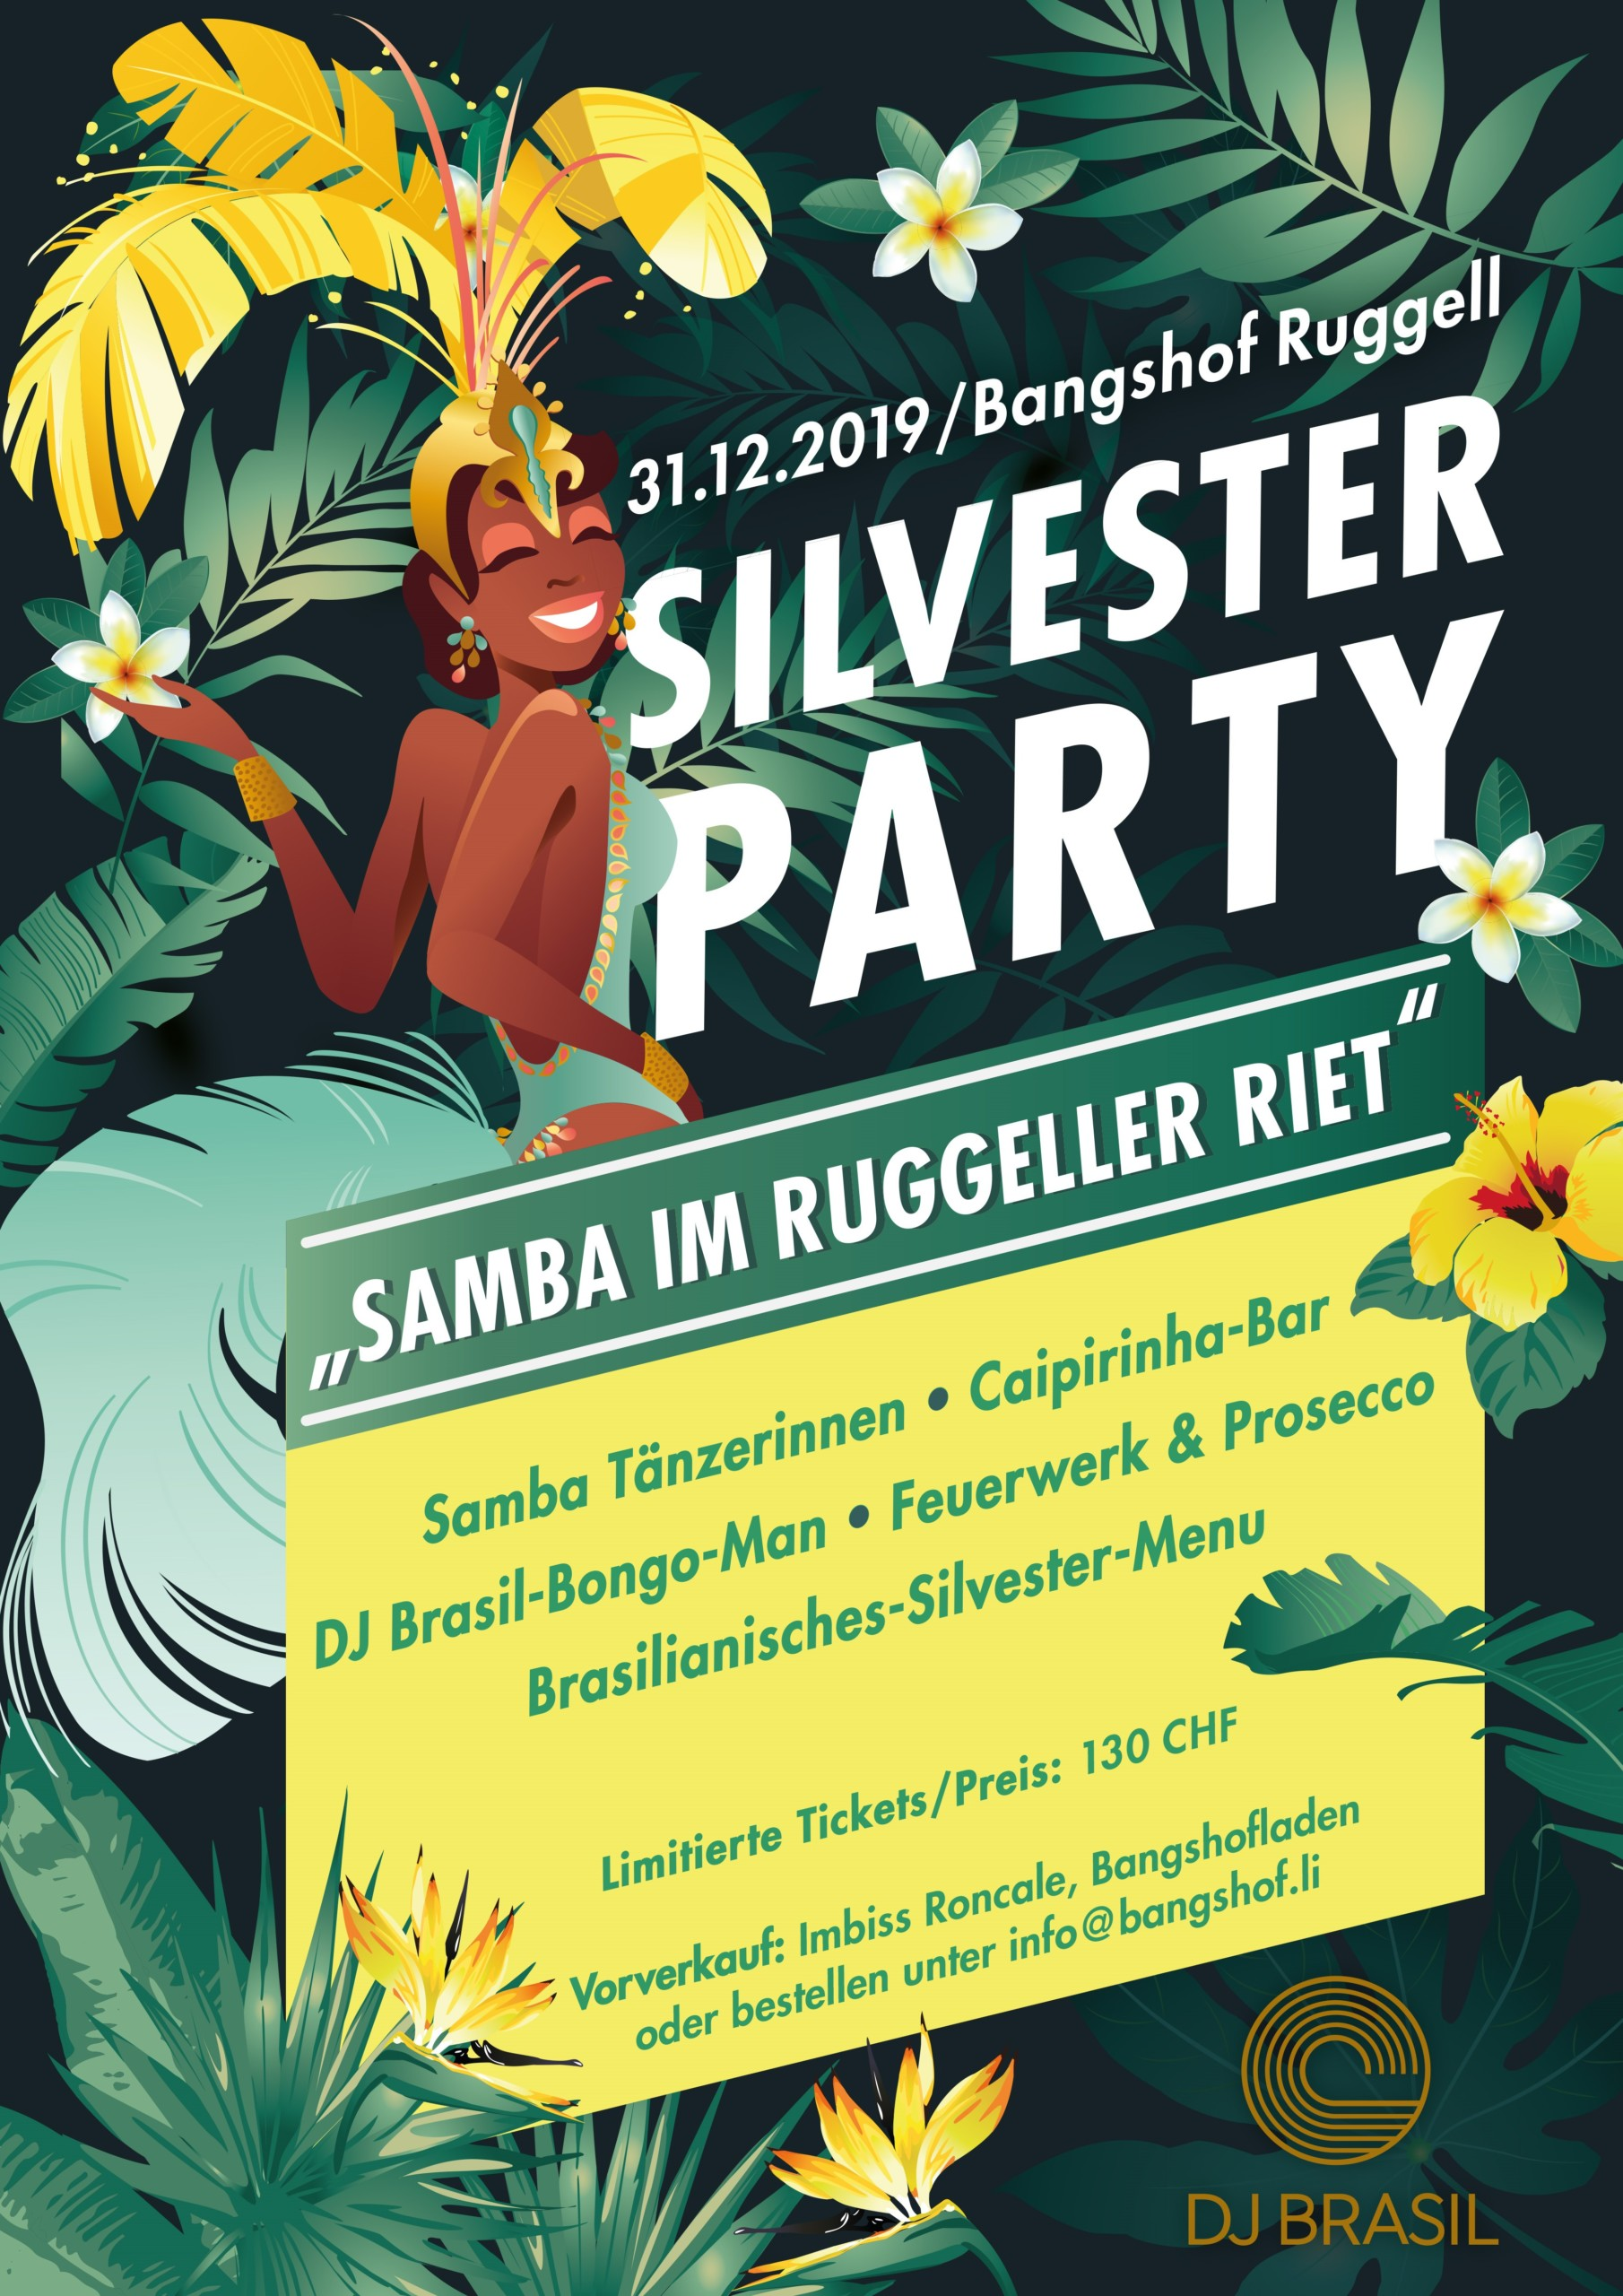 Silvester Party auf dem Bangshof Ruggell